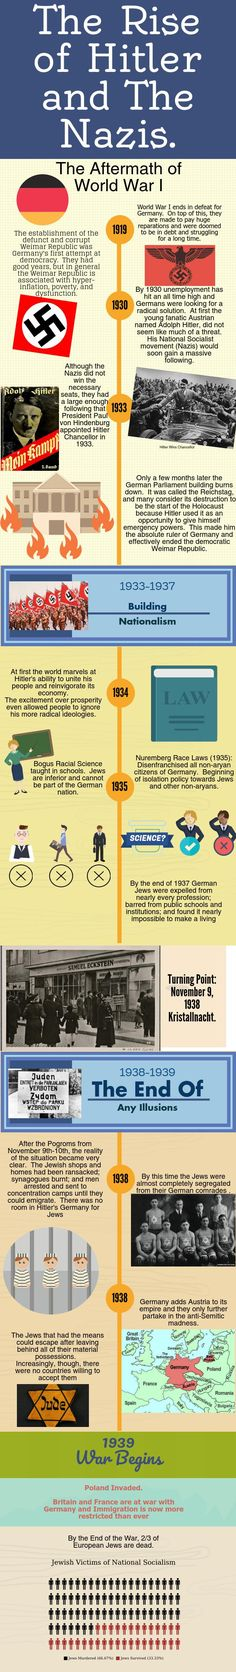 The Holocaust: Beginnings. | @Piktochart Infographic